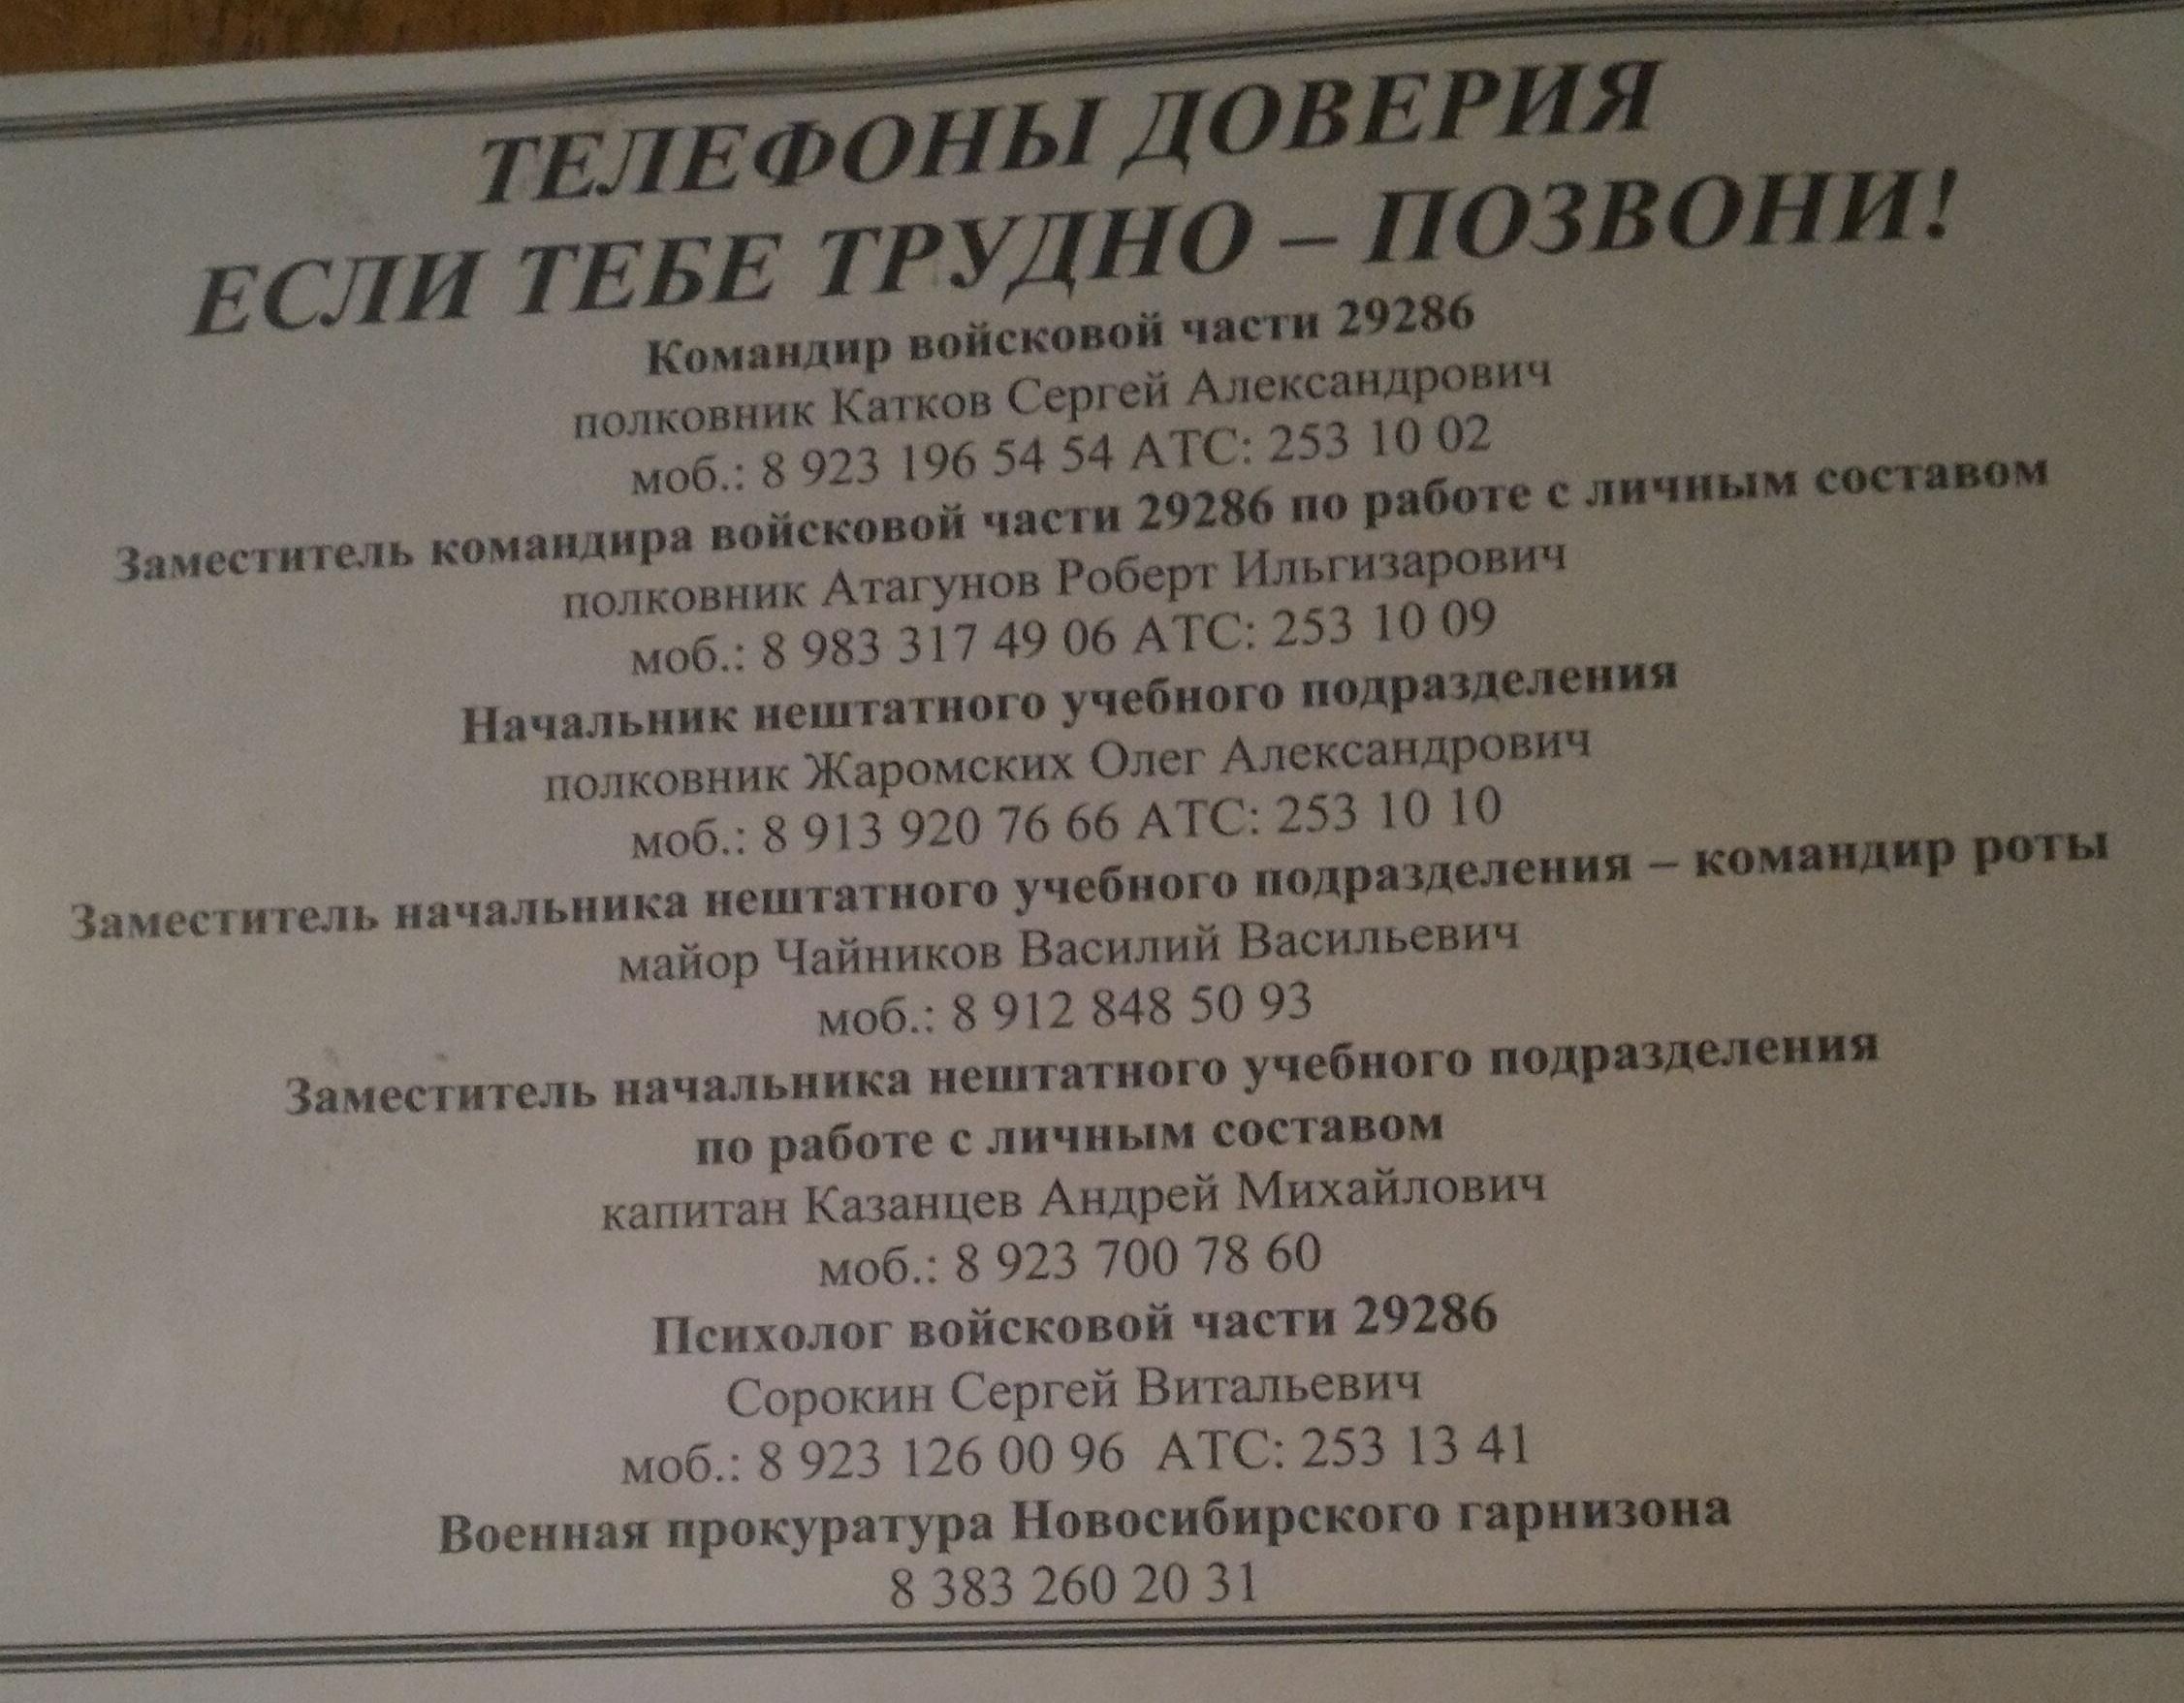 http://sh.uploads.ru/Upvwl.jpg